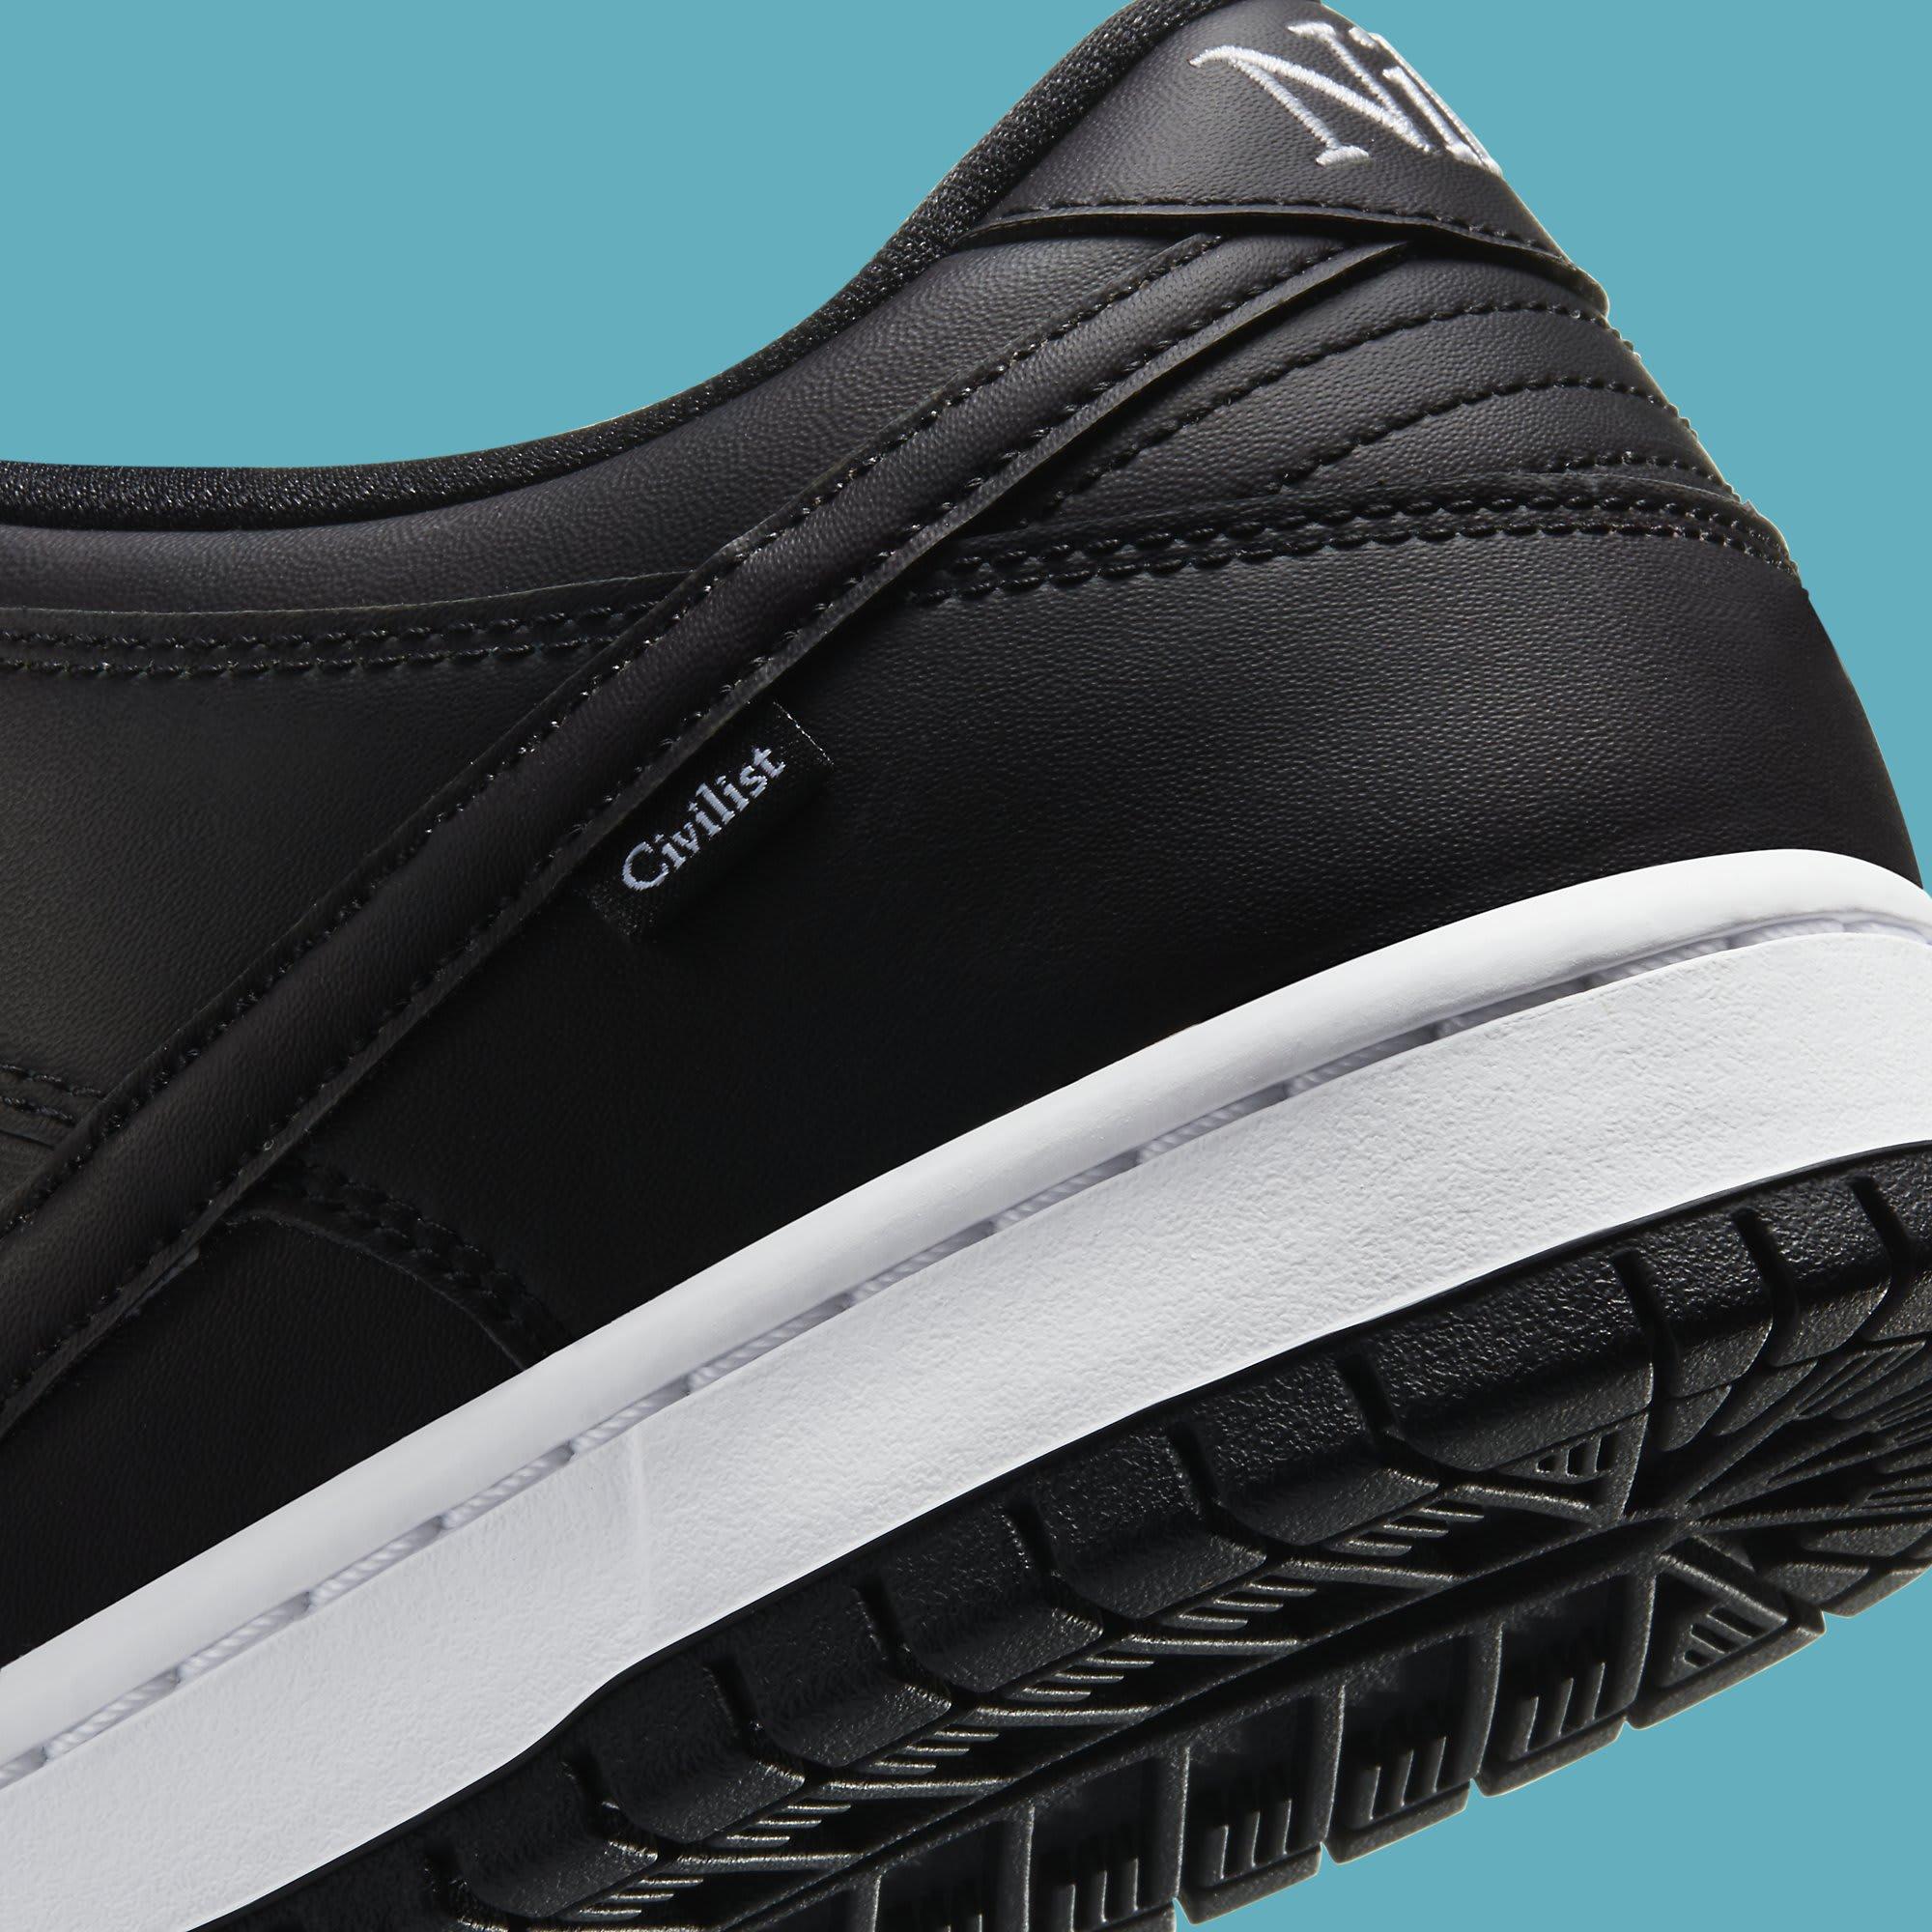 Civilist x Nike SB Dunk Low Heat Map Release Date CZ5123-001 Heel Detail